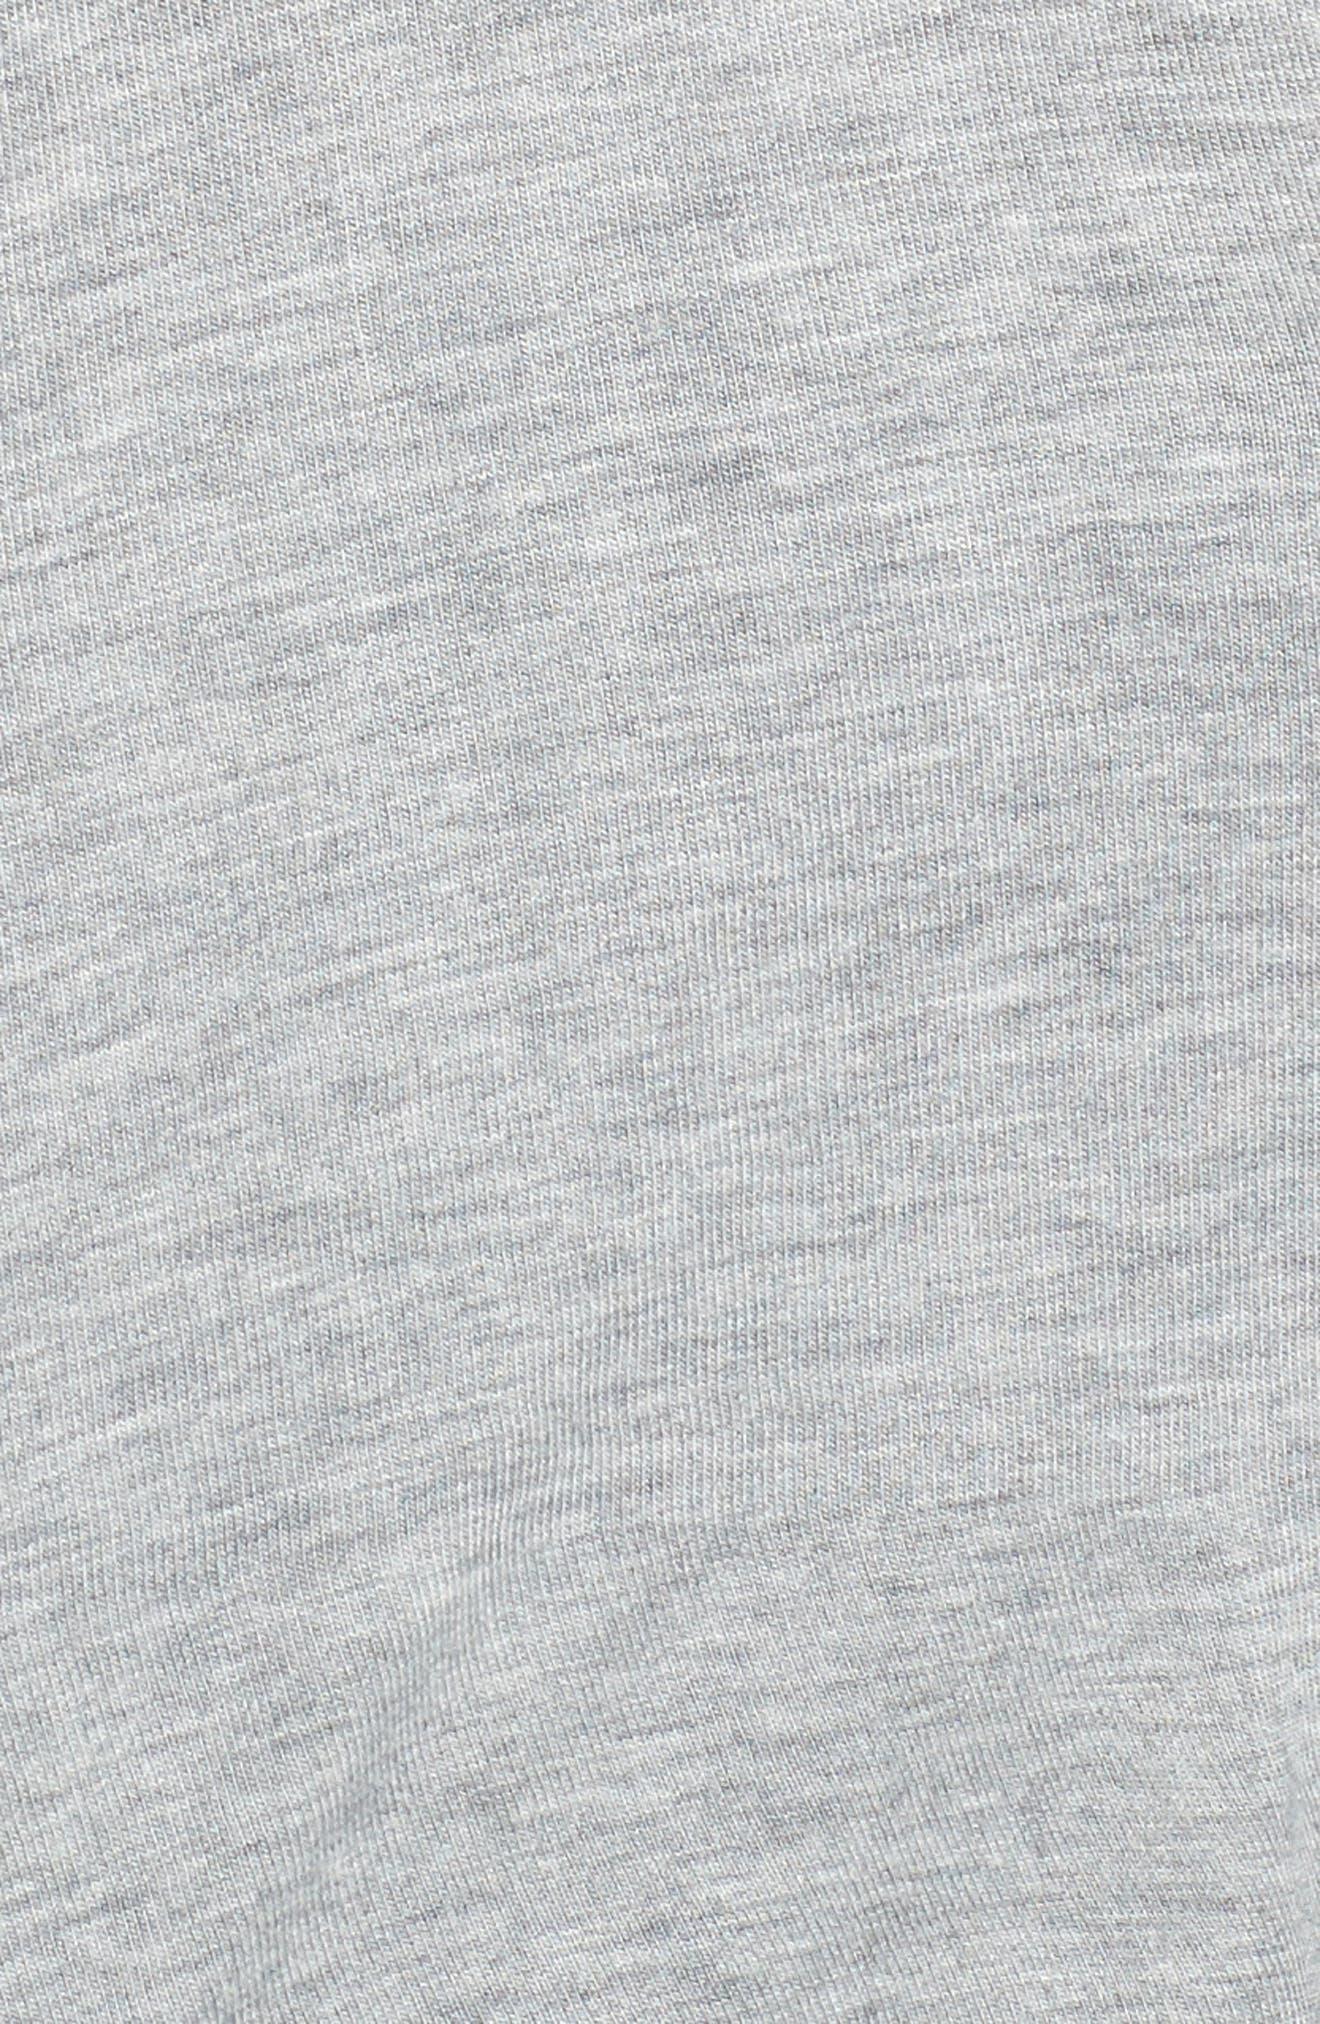 Bell Sleeve Turtleneck,                             Alternate thumbnail 5, color,                             030